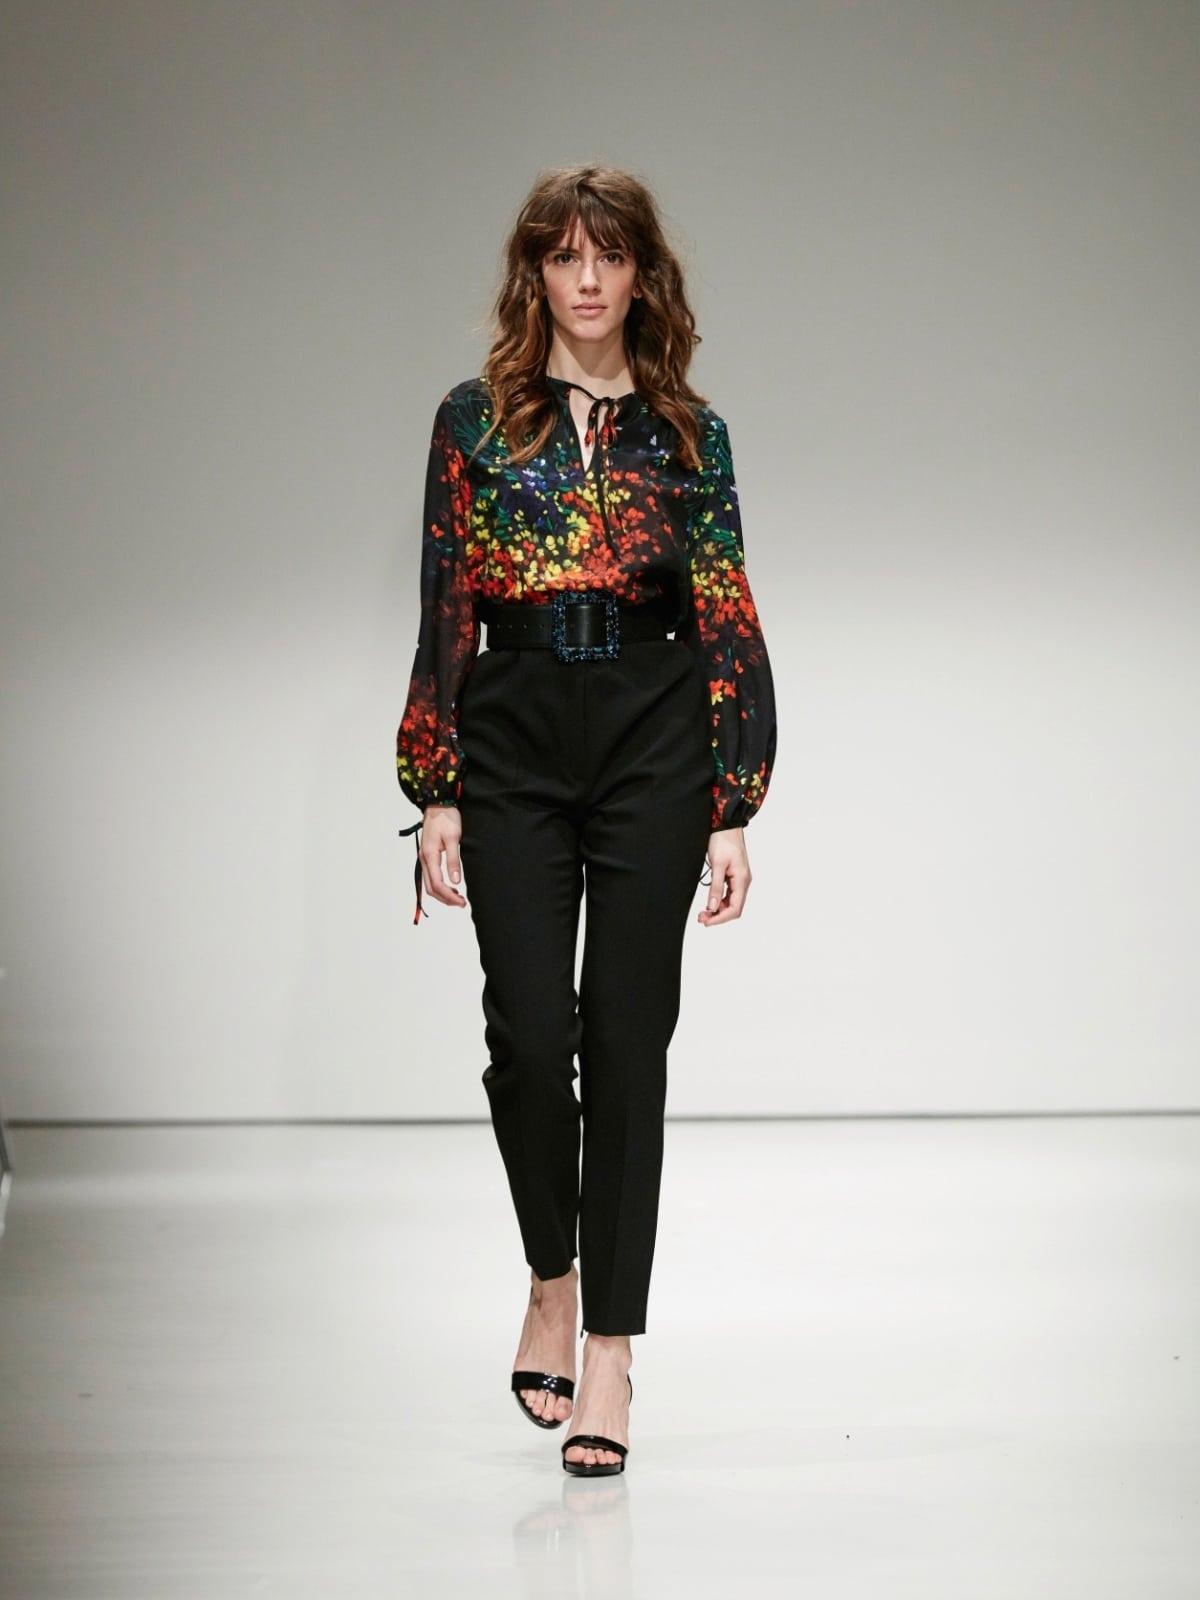 Escada Silk Flower Print Top and High Waist Pant